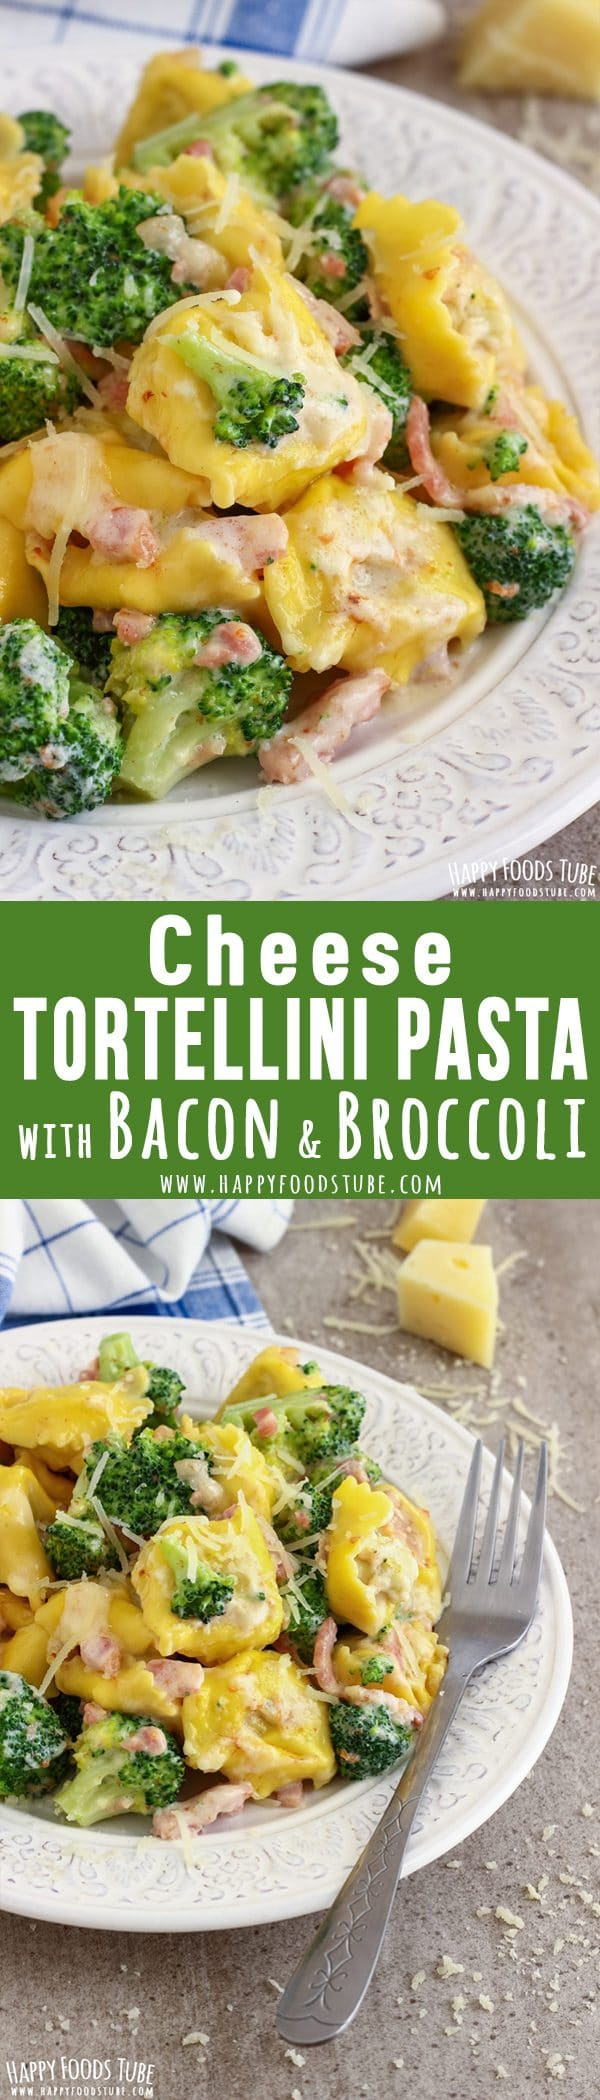 Cheese Tortellini Pasta with Broccoli and Bacon Recipe Picture